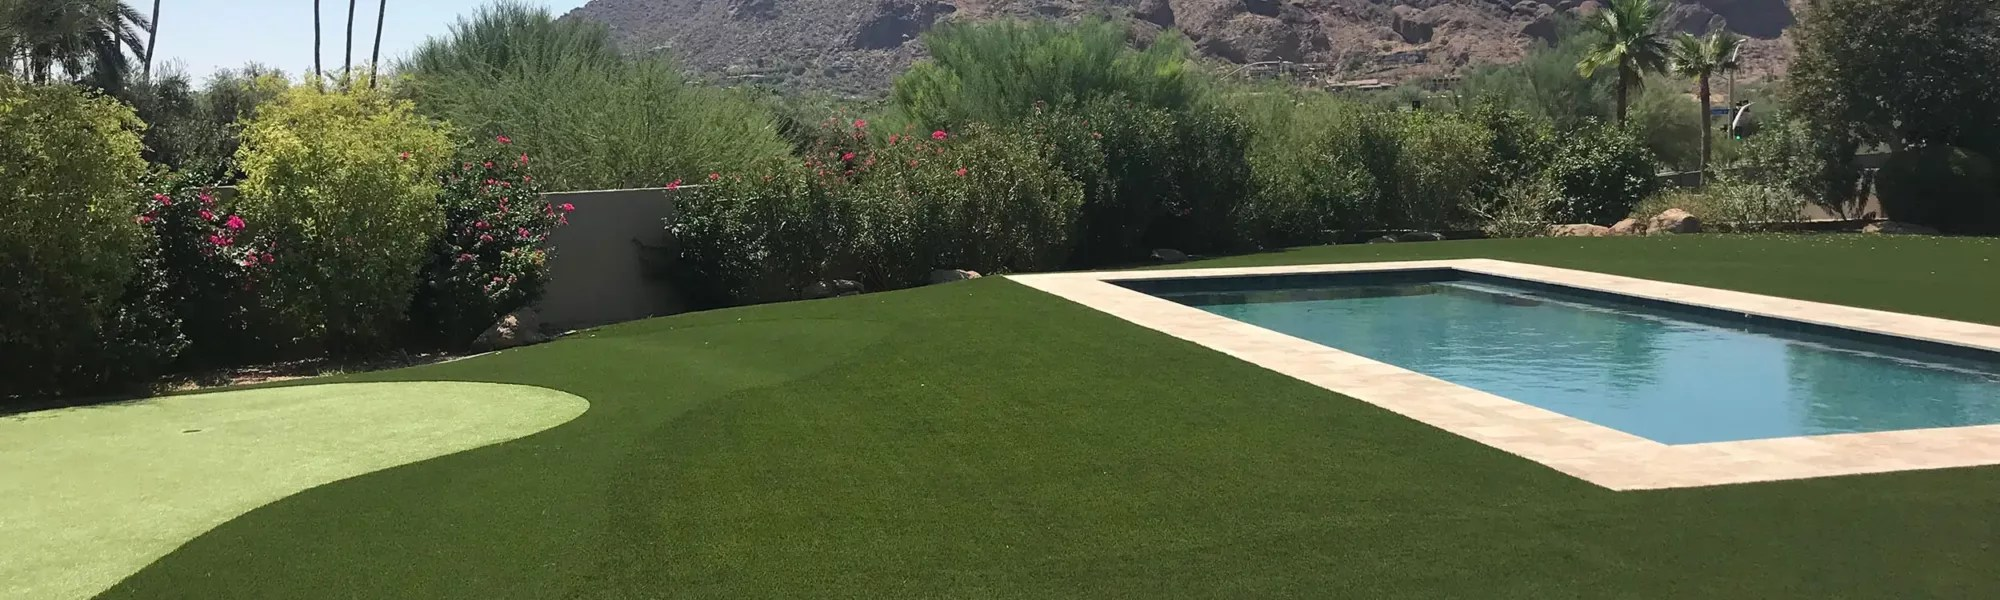 scottsdale-artificial-grass-backyard.jpg